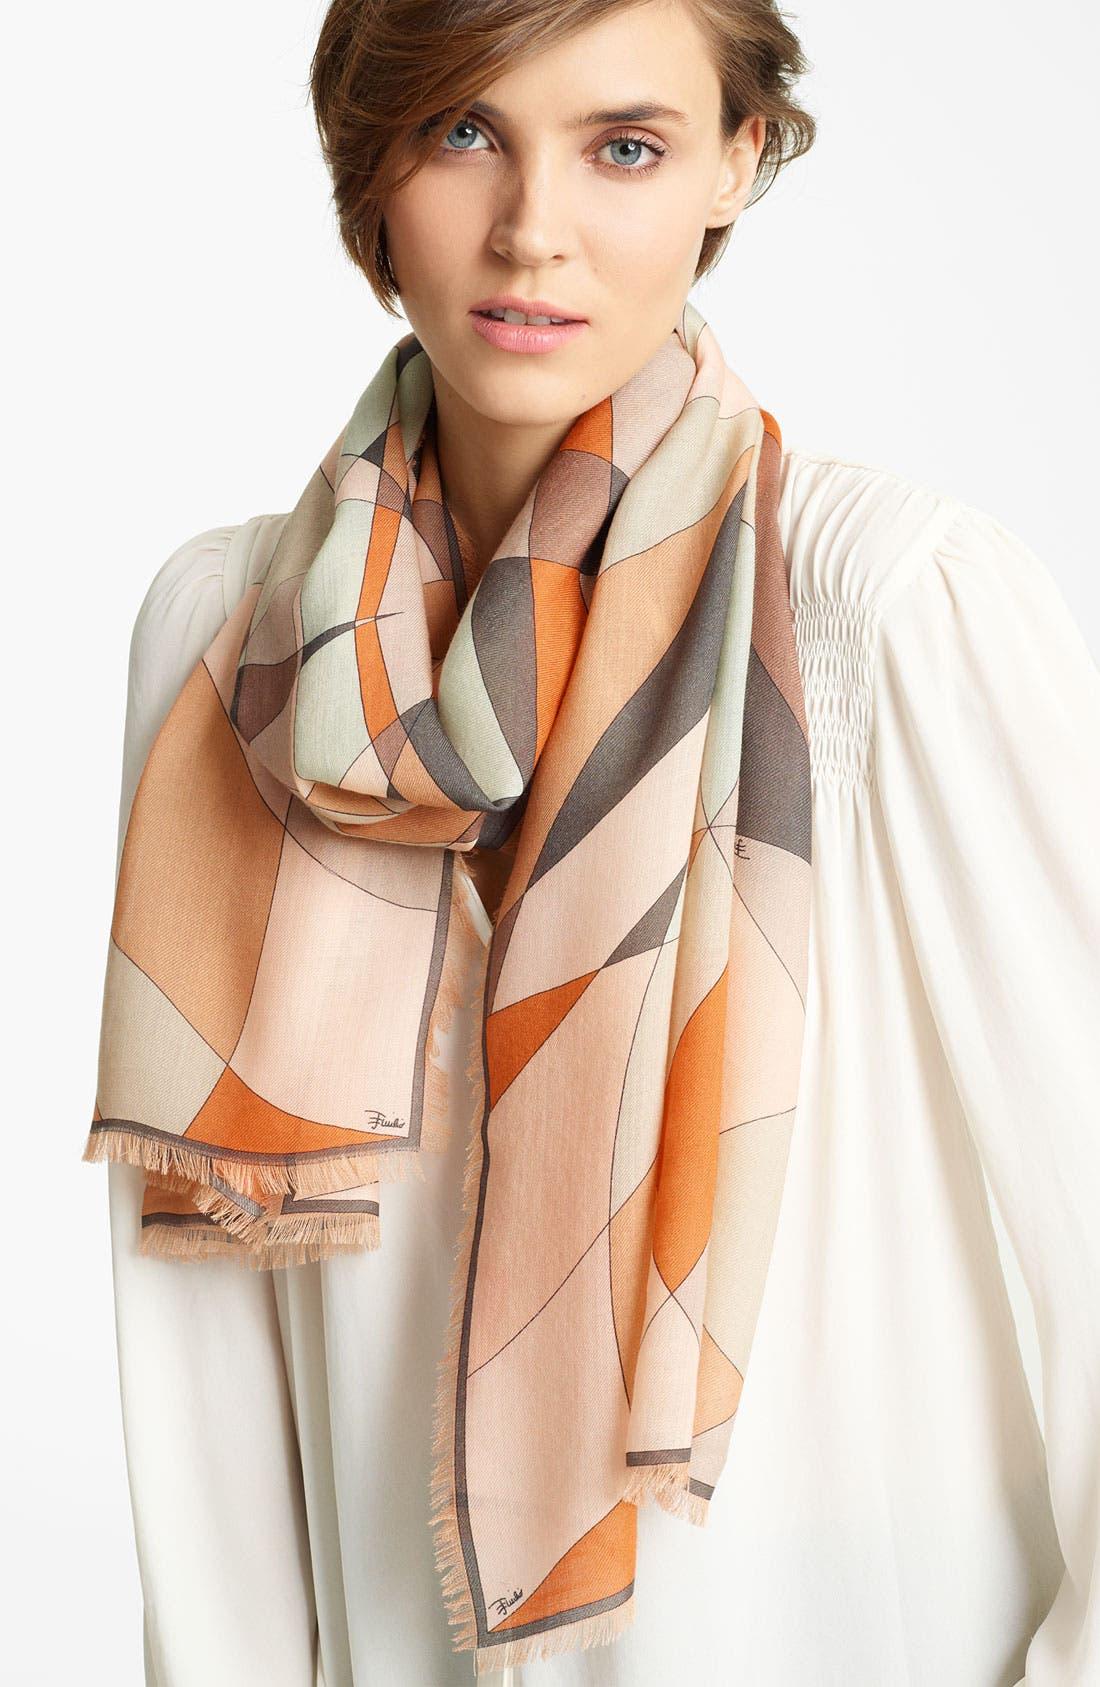 Alternate Image 1 Selected - Emilio Pucci 'Fantasia' Wool Scarf